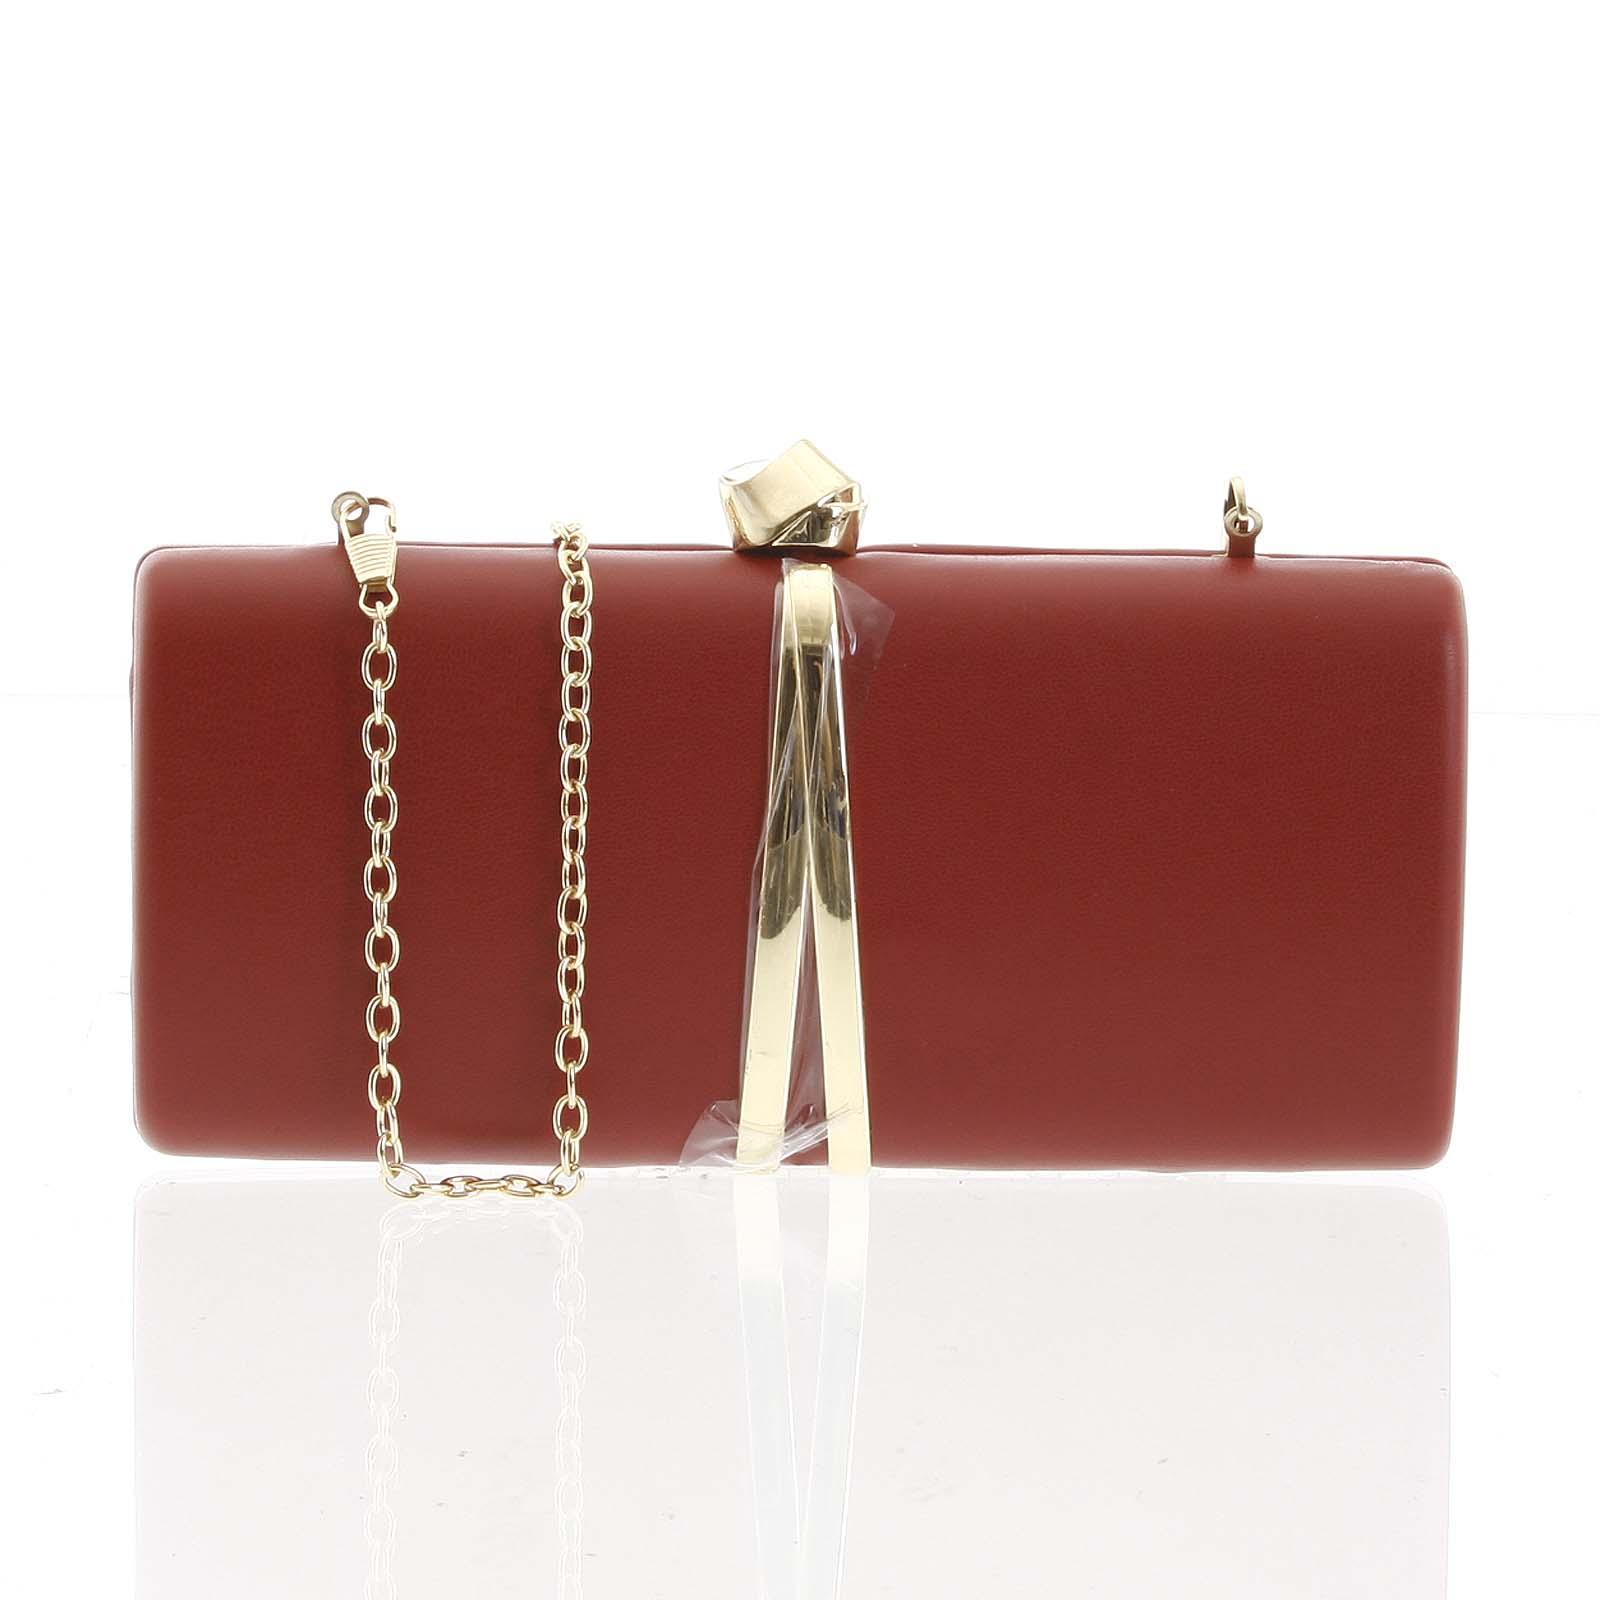 Exkluzívna malá dámska listová kabelka tmavočervená - Delami ZL2097